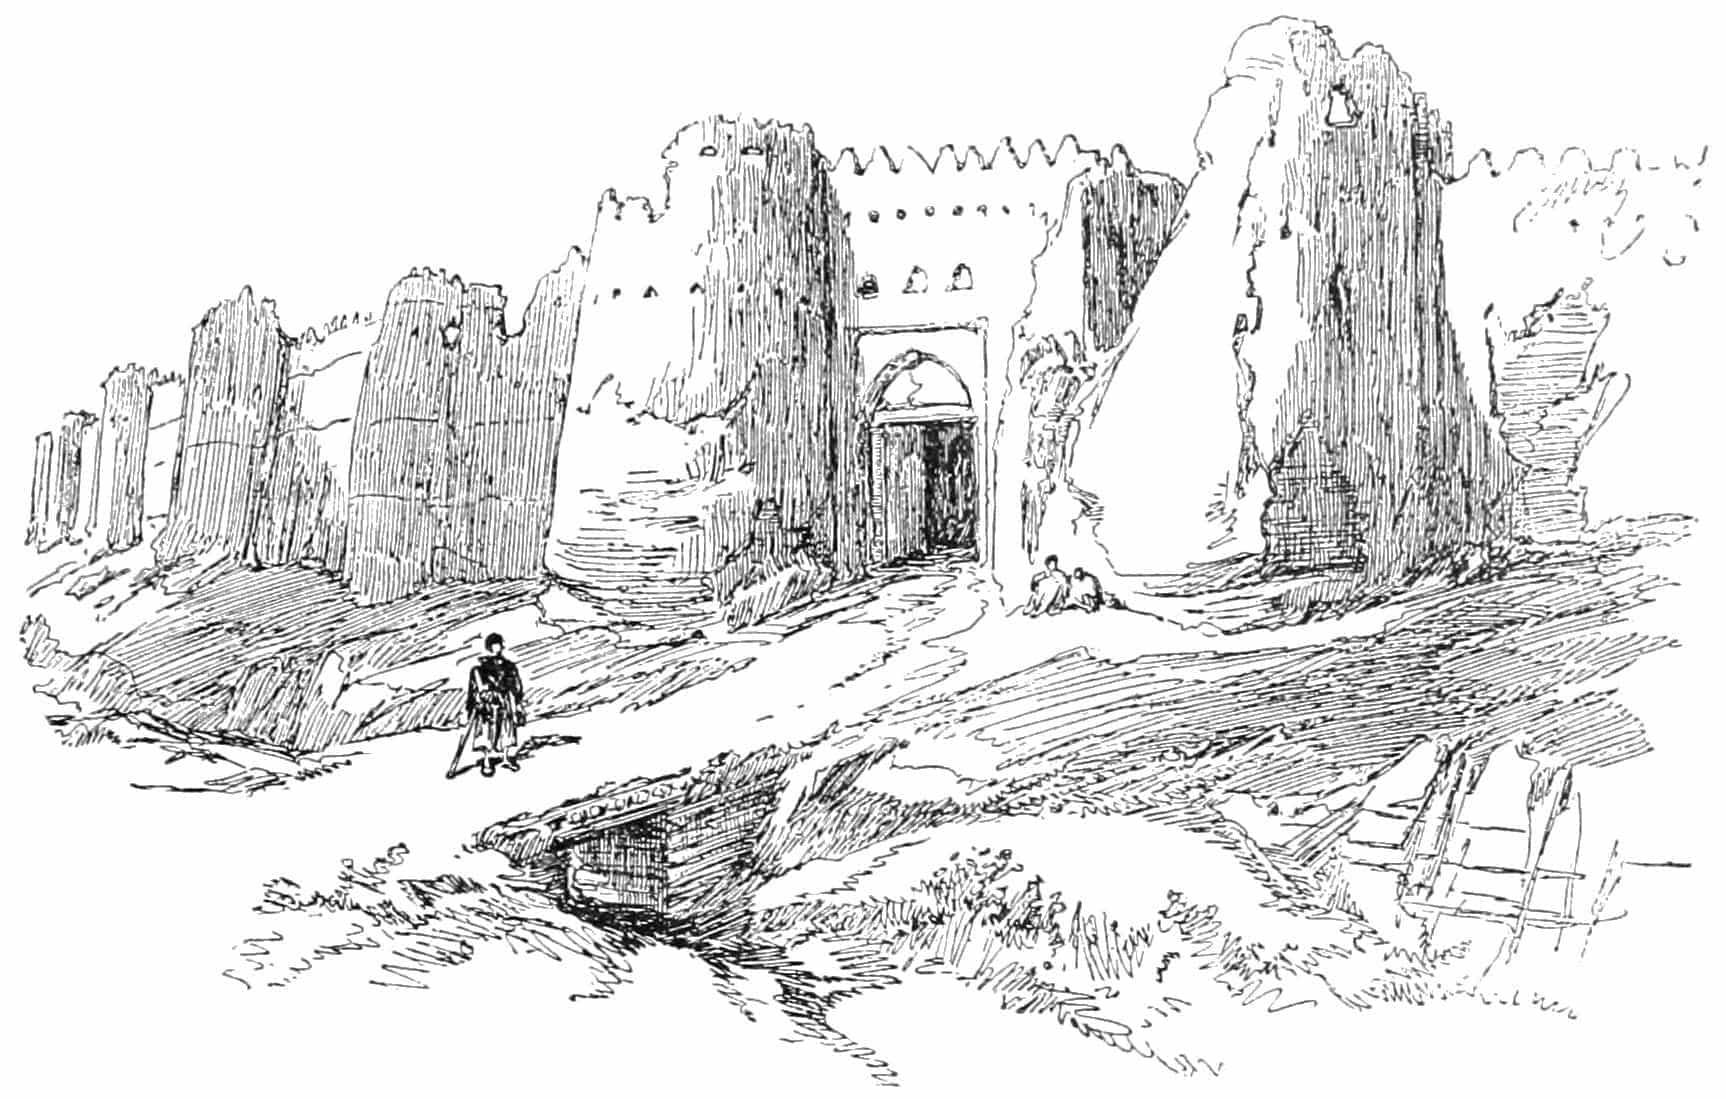 Стены Хорассана Рисунок неизв. худ. 1891г.